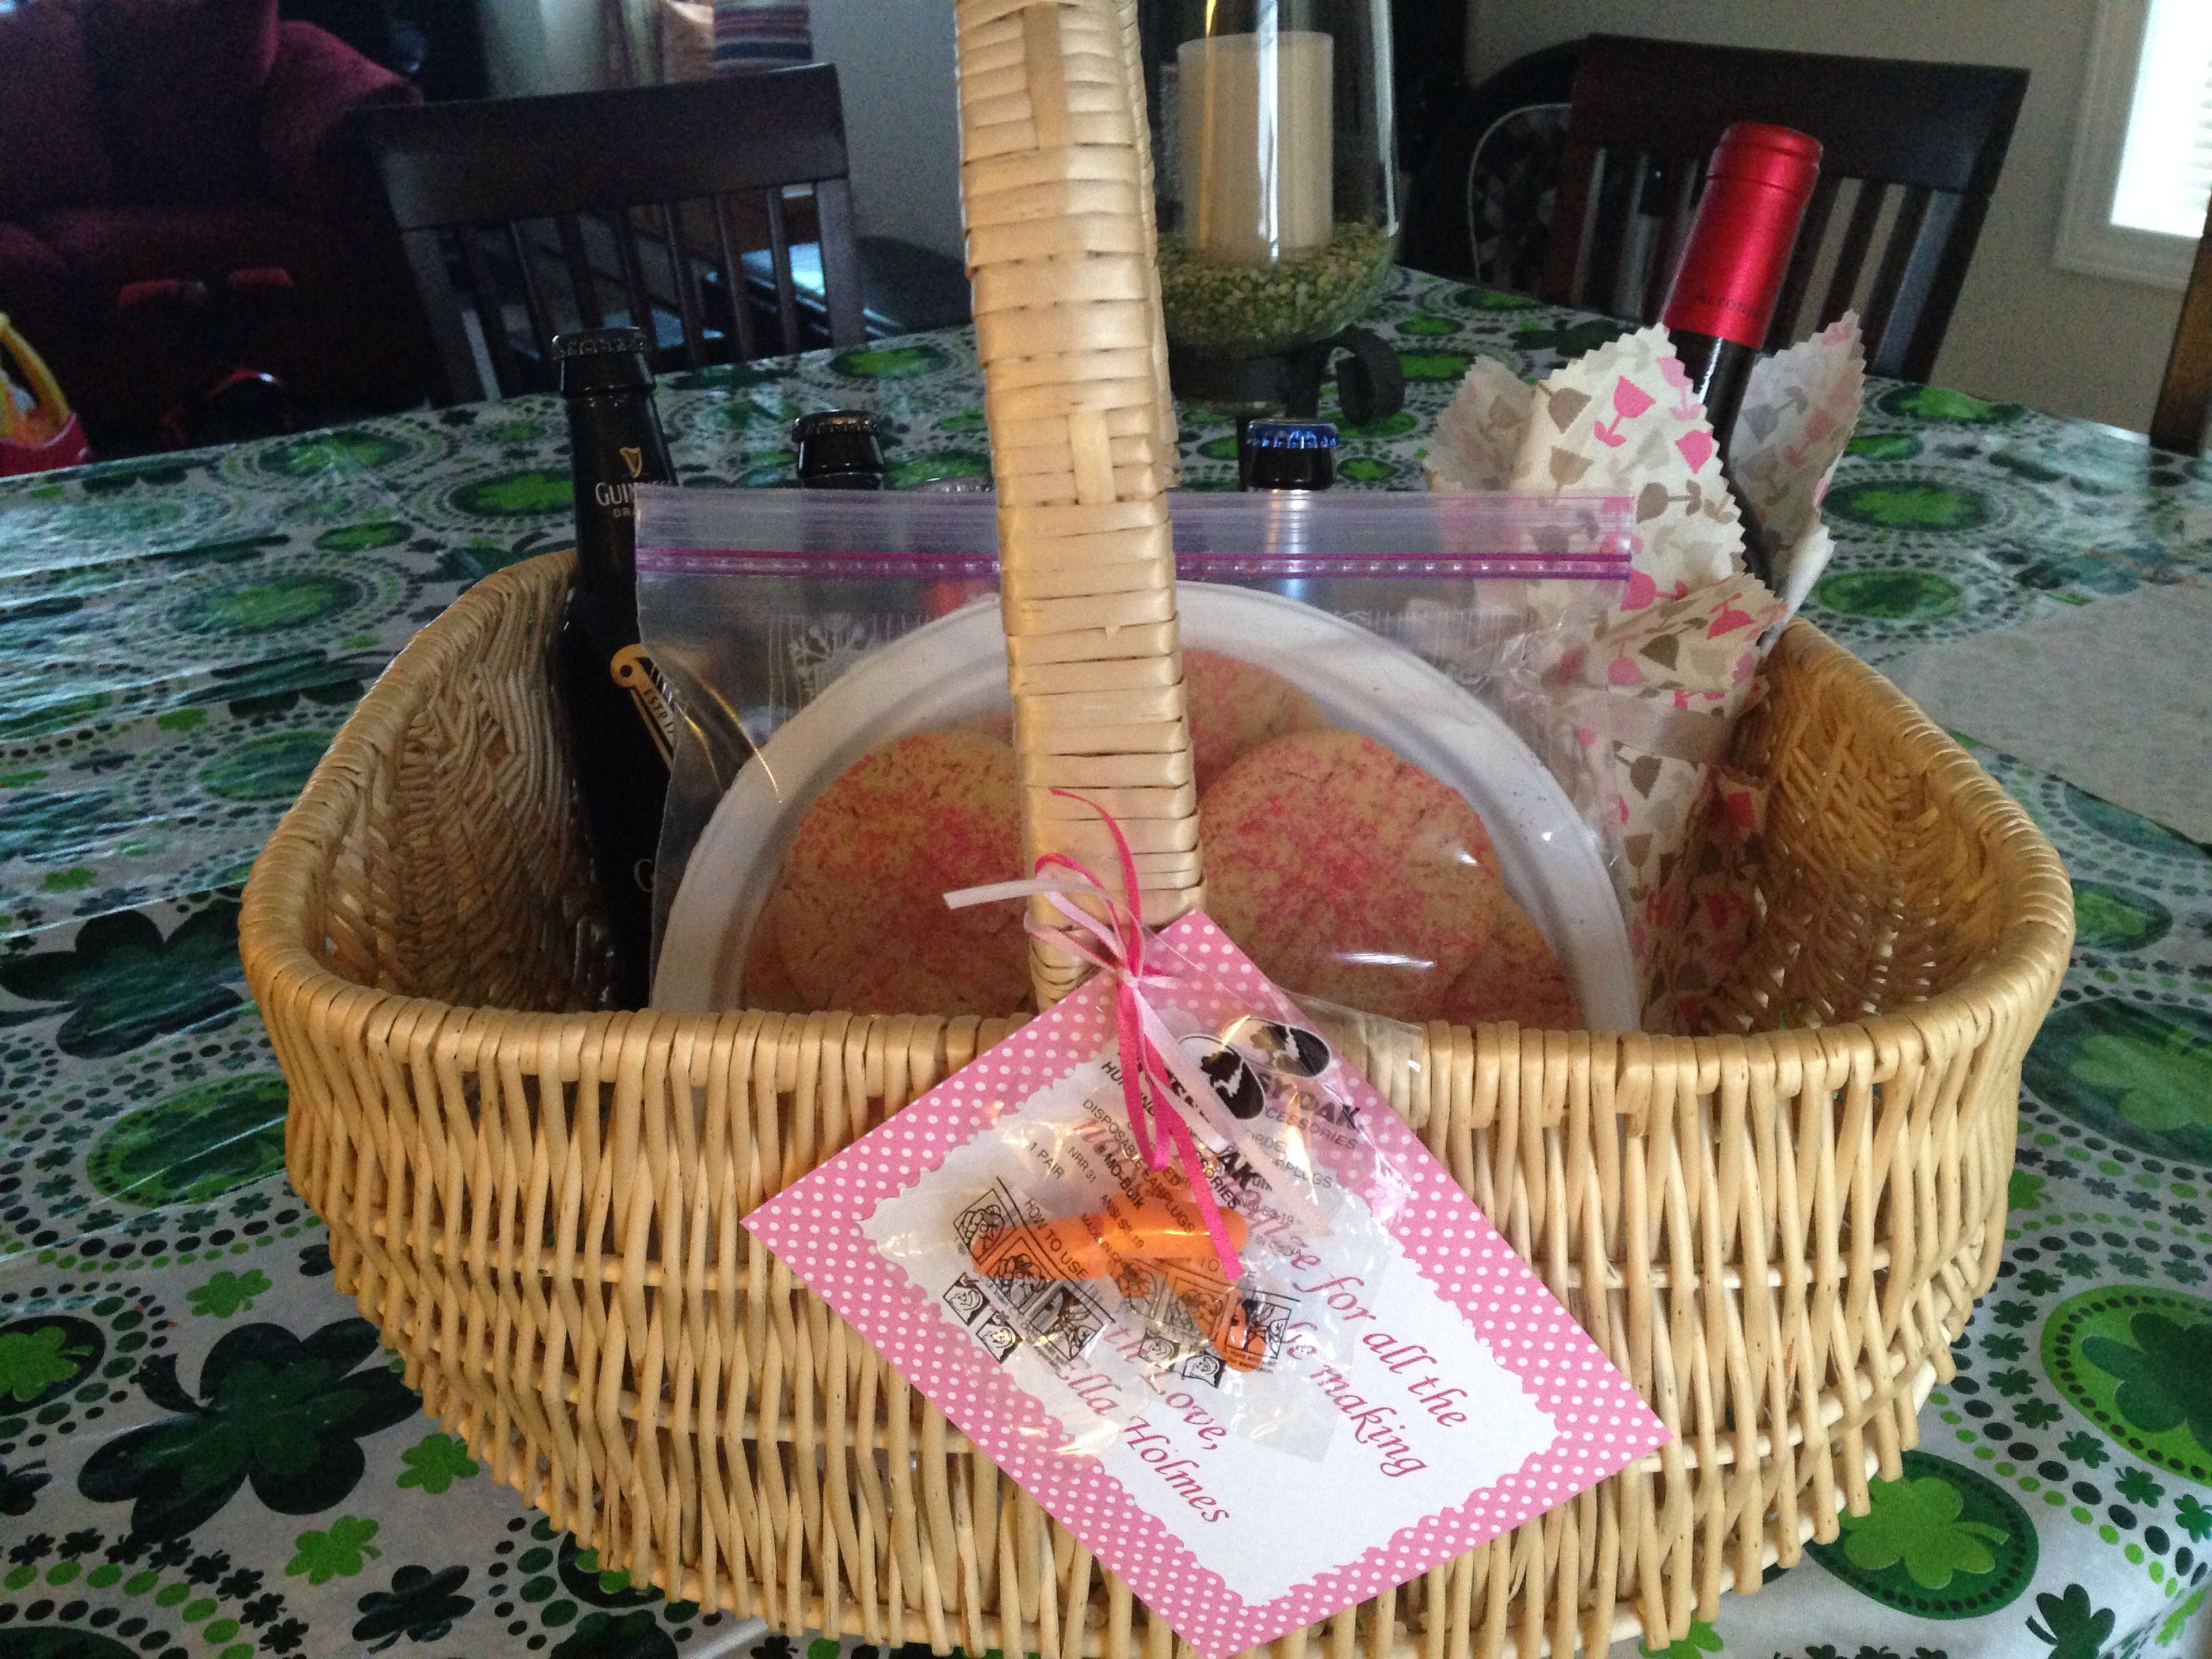 Gift for neighbors bringing newborn home wine beer